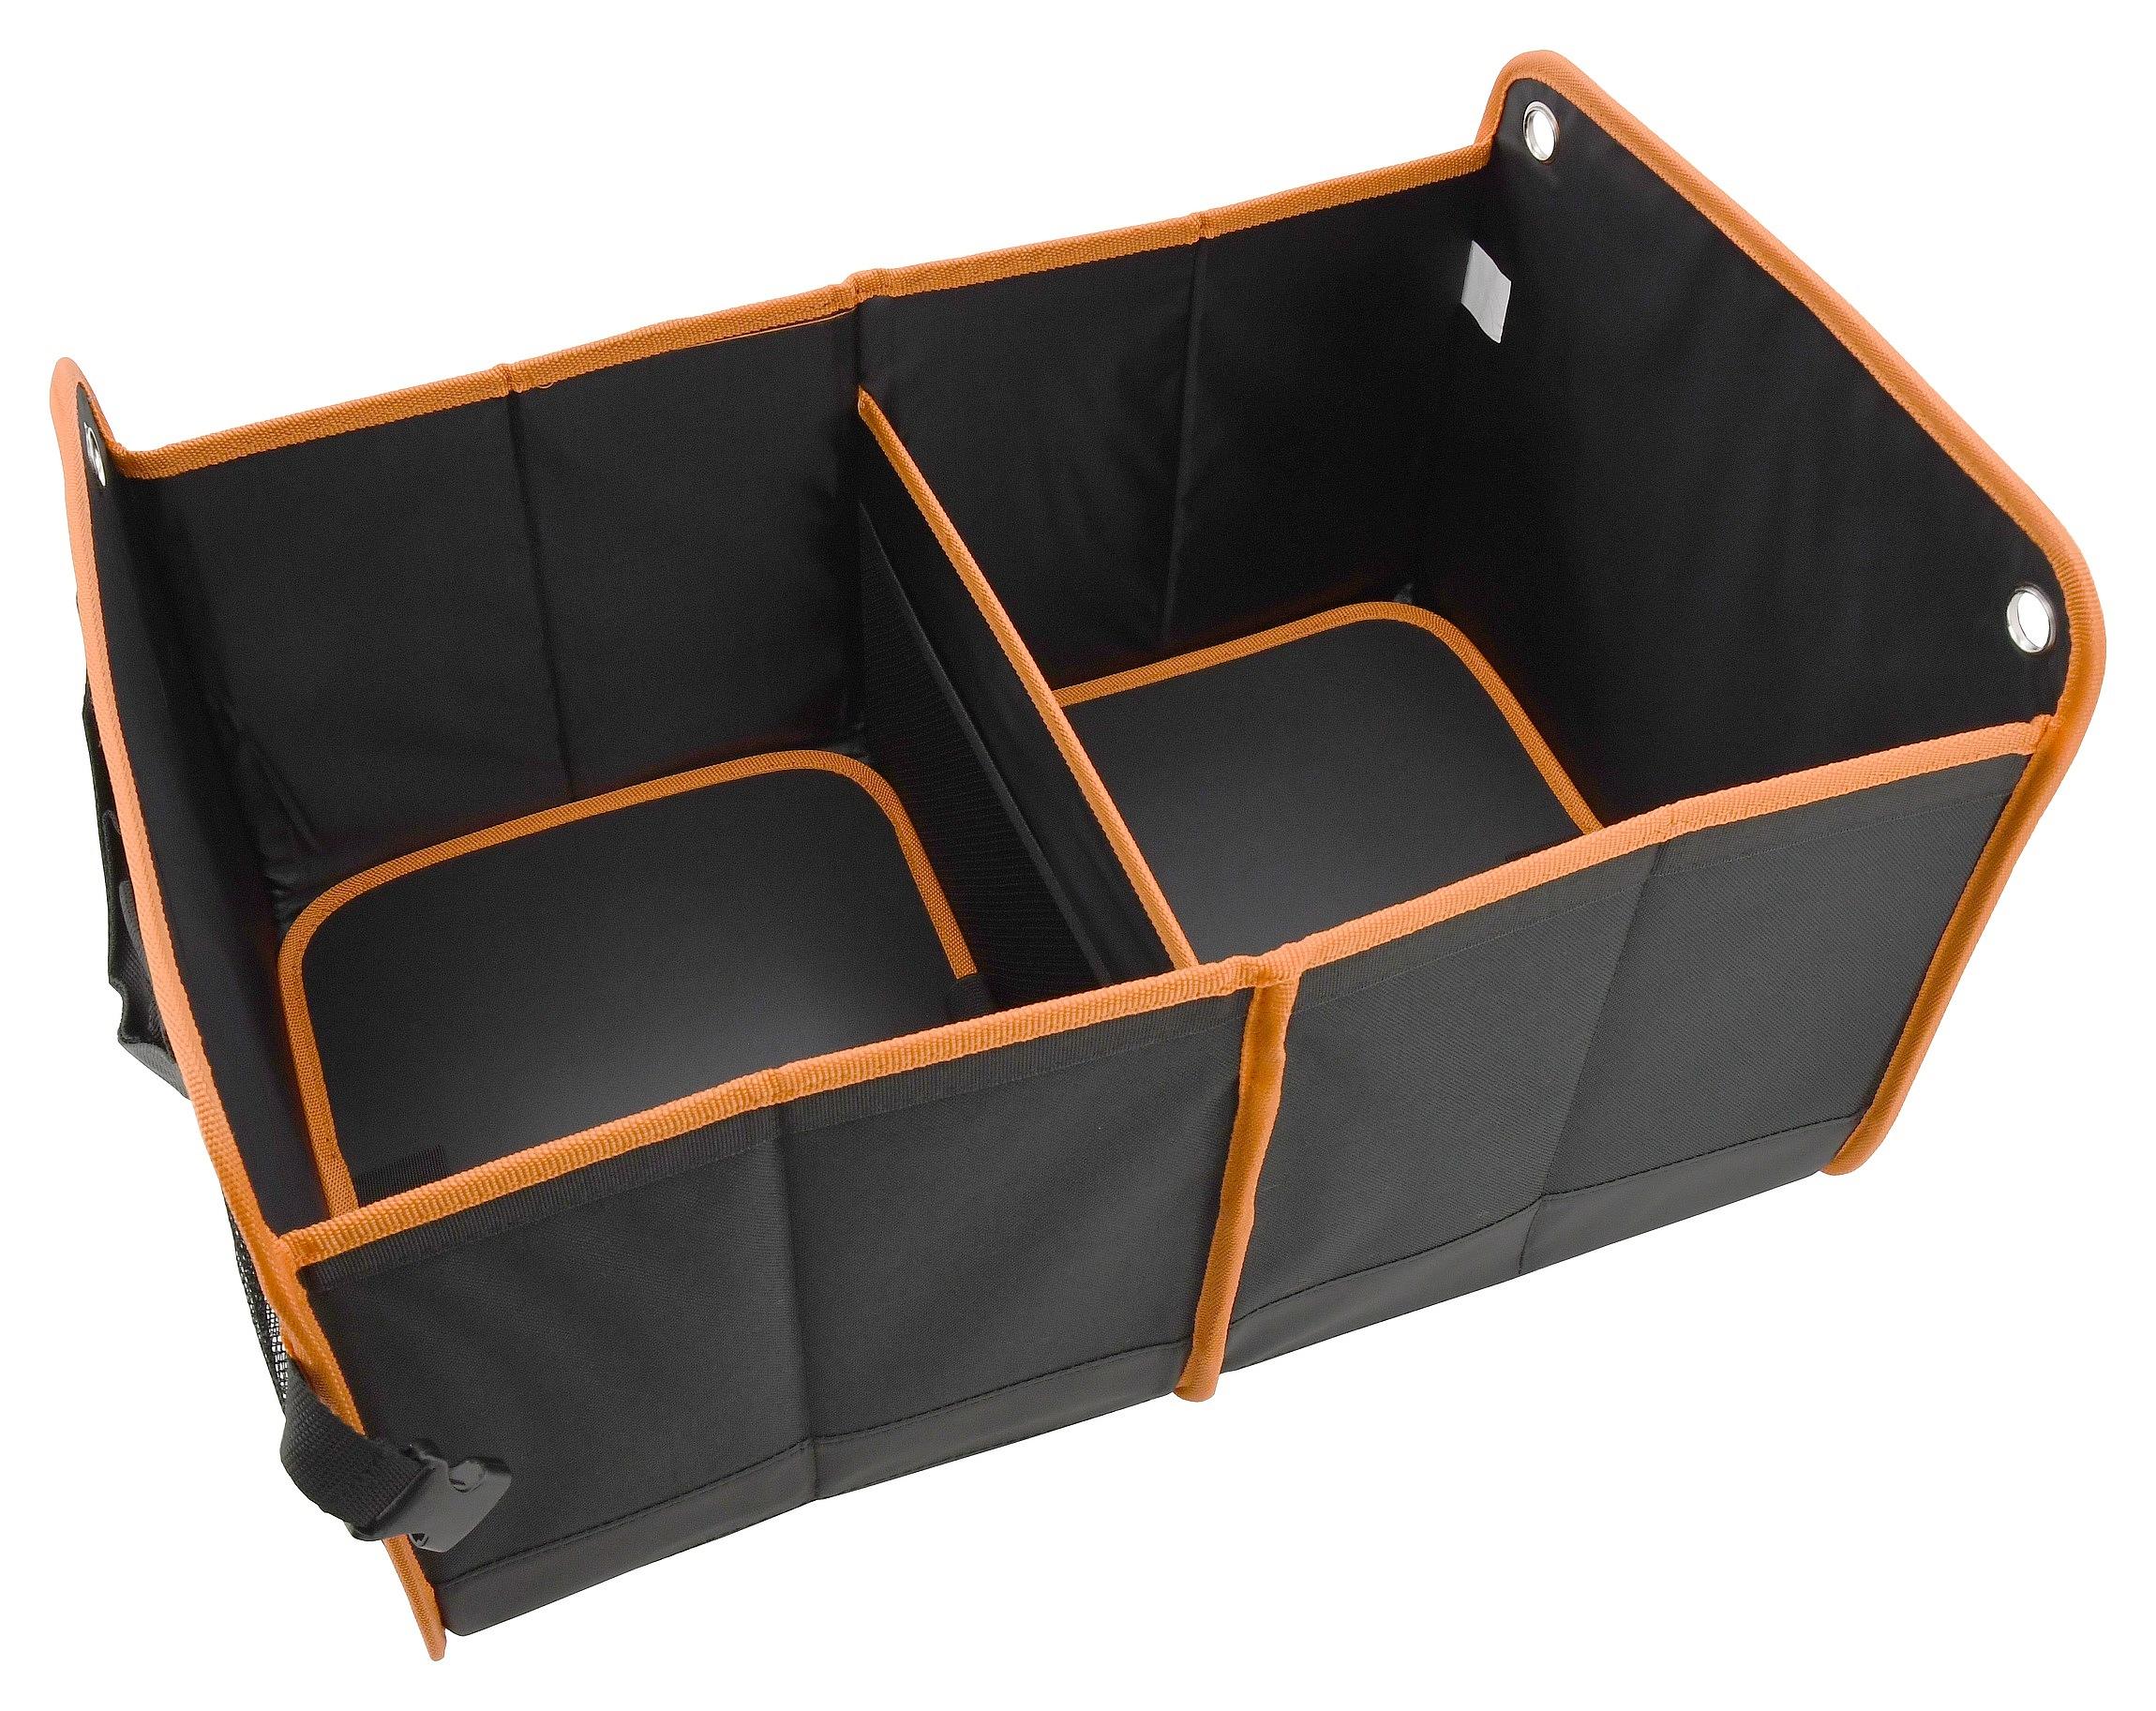 Organizér do kufru dvojitý 54x34cm ORANGE